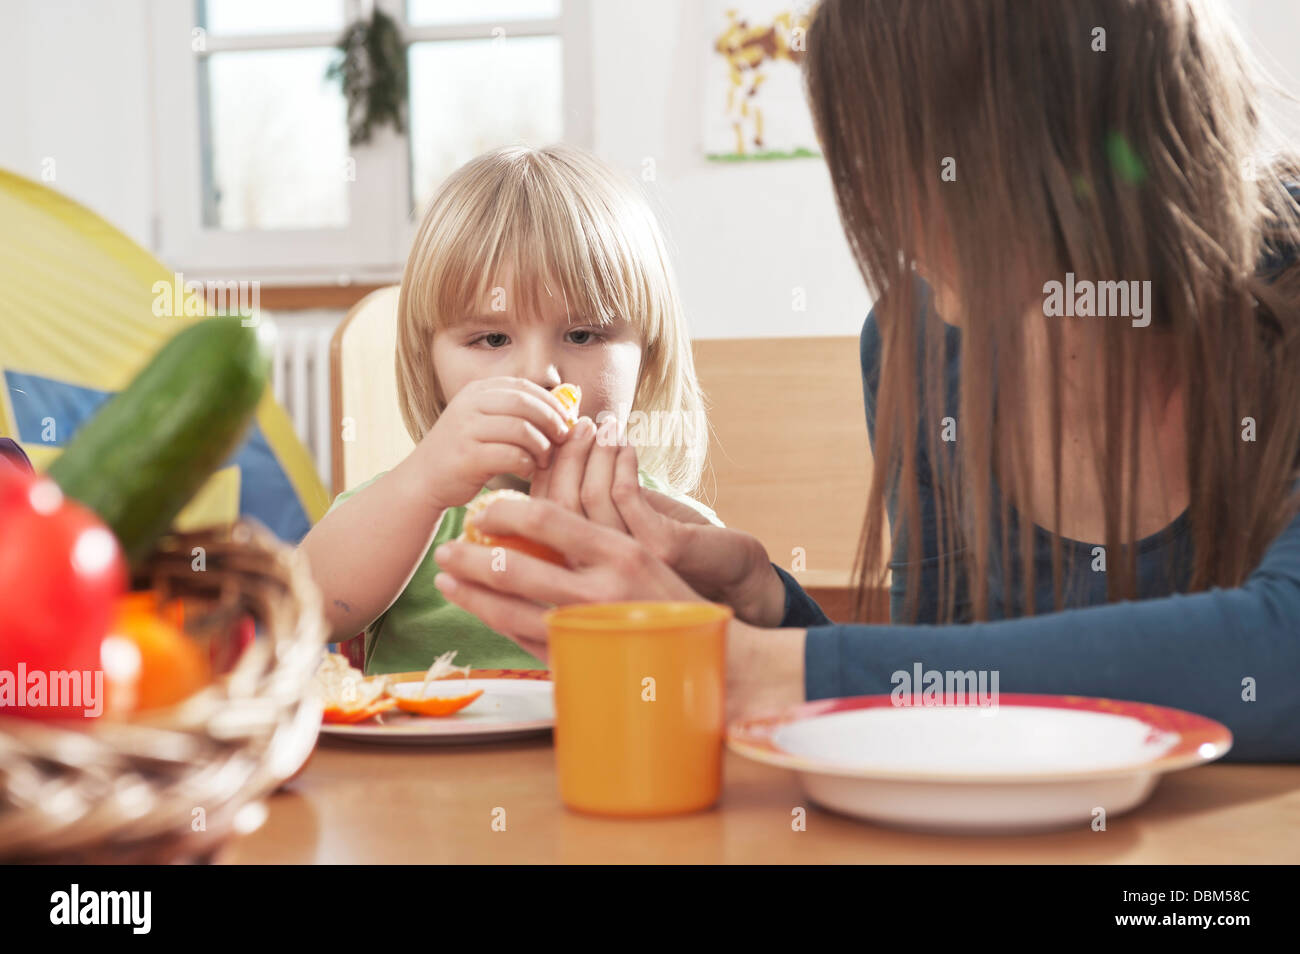 Female Carer And Boy Sitting At Table, Kottgeisering, Bavaria, Germany, Europe - Stock Image